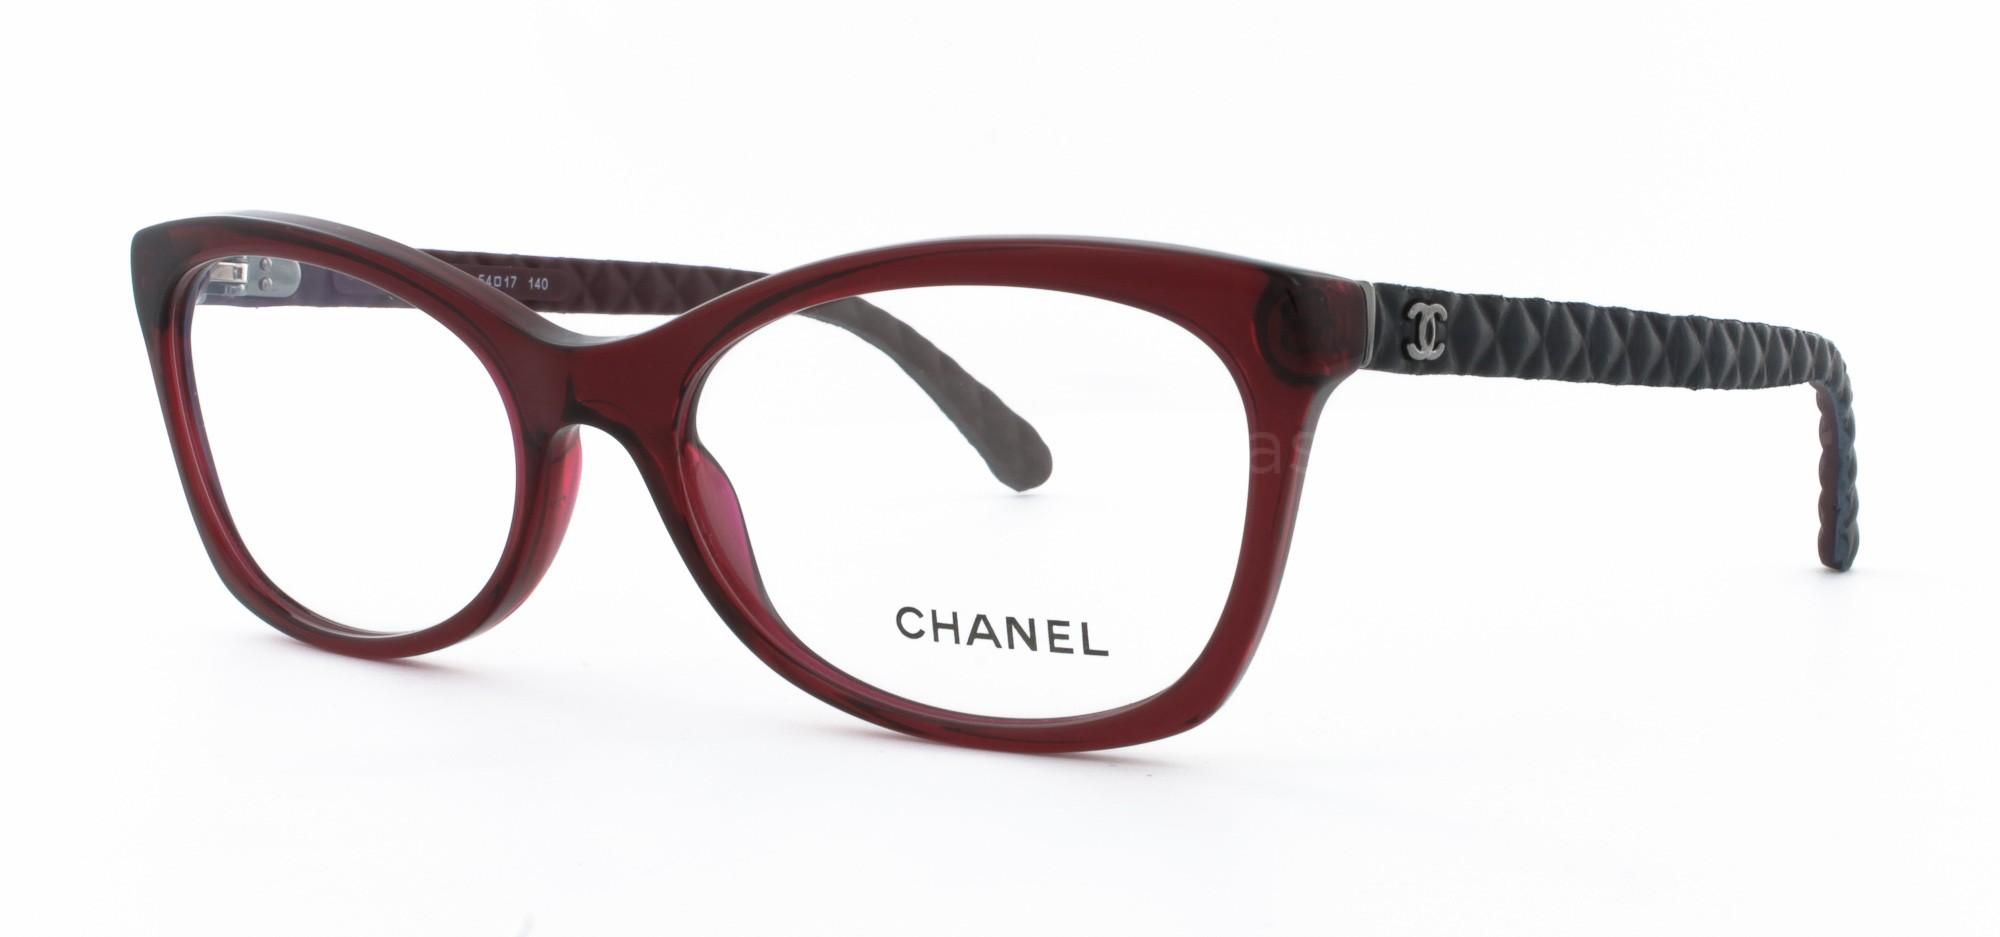 Eyeglasses Frame Chanel : Chanel 3287Q Eyeglasses